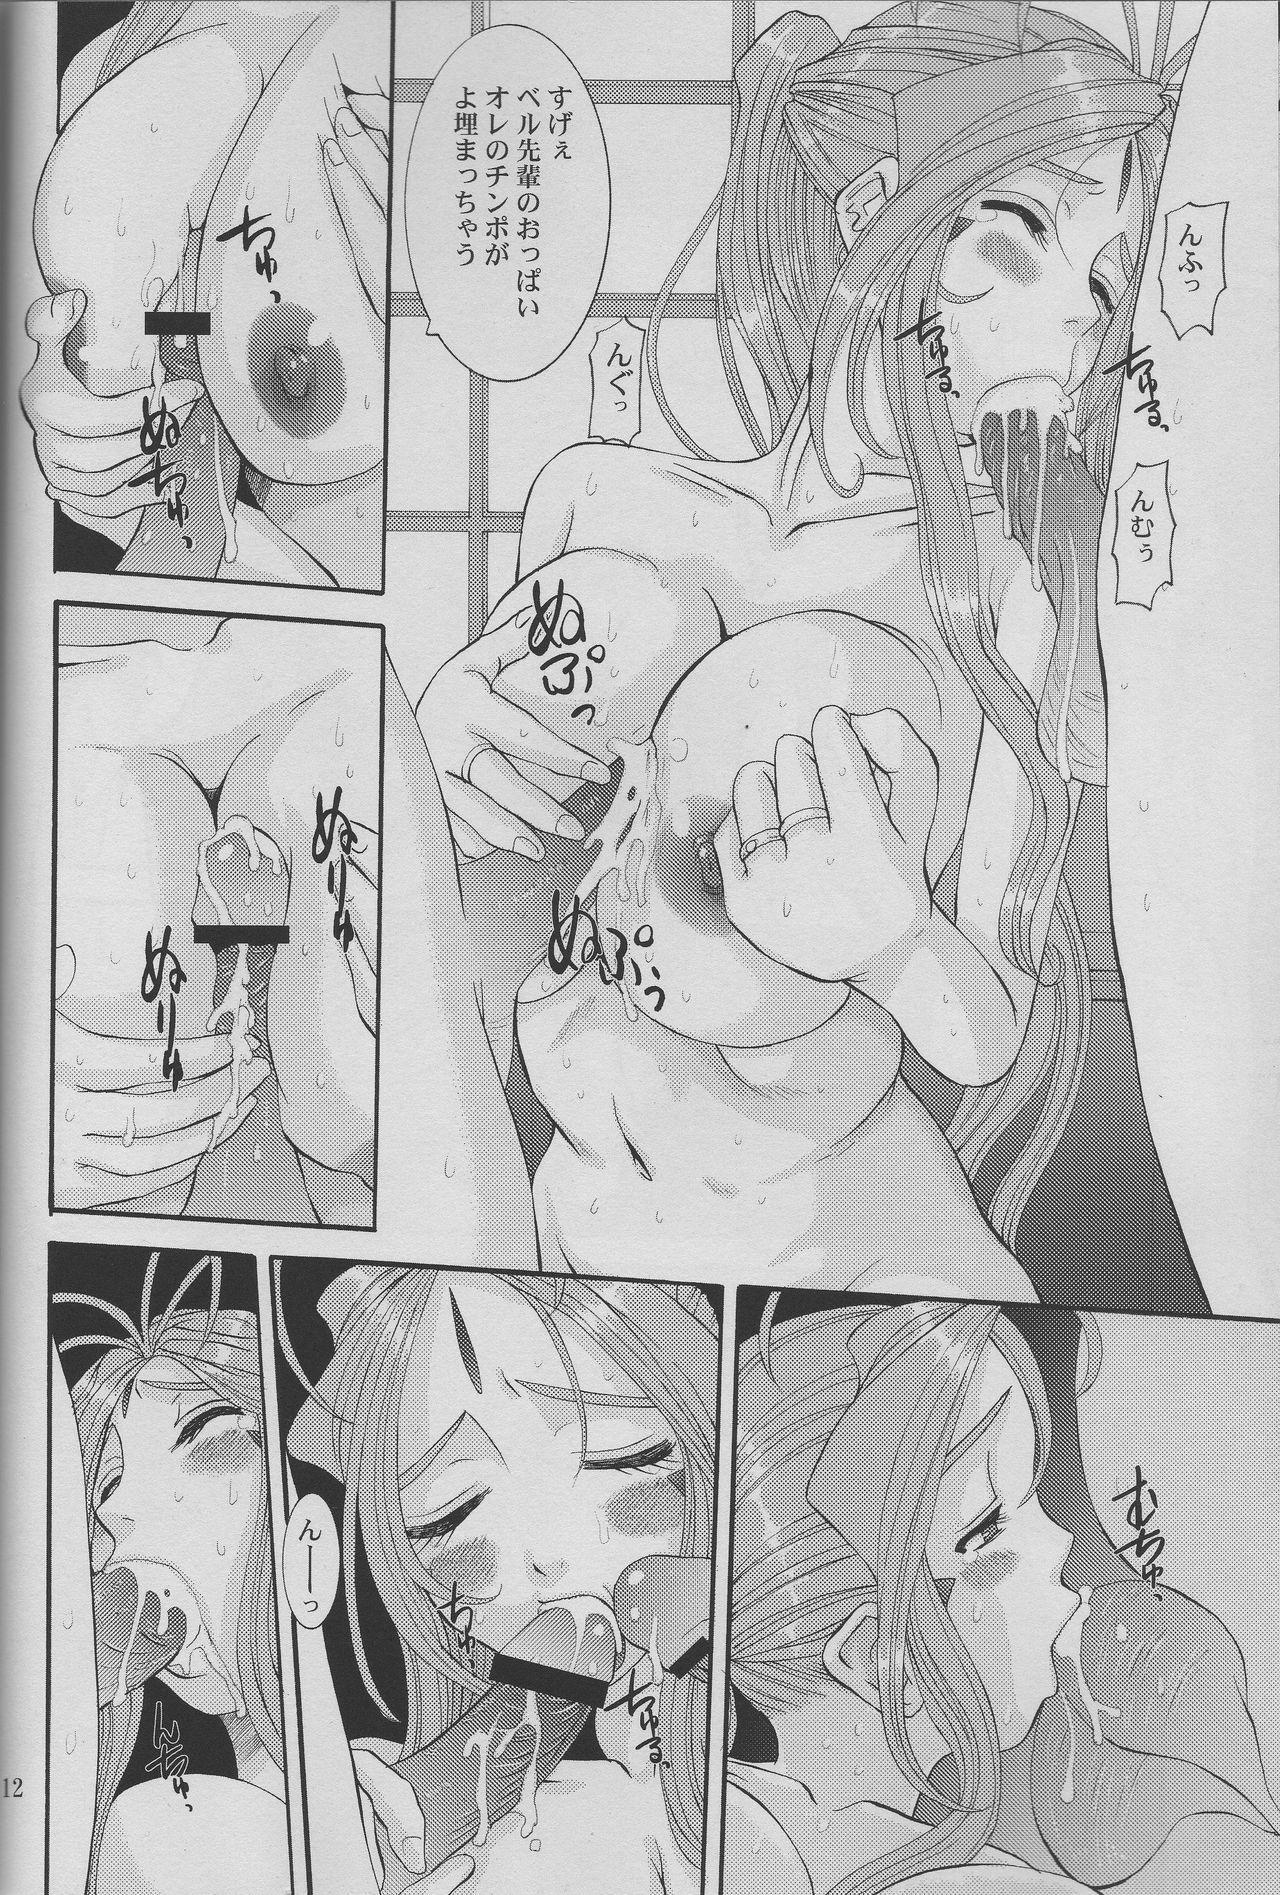 Nightmare of My Goddess Vol. 9 10